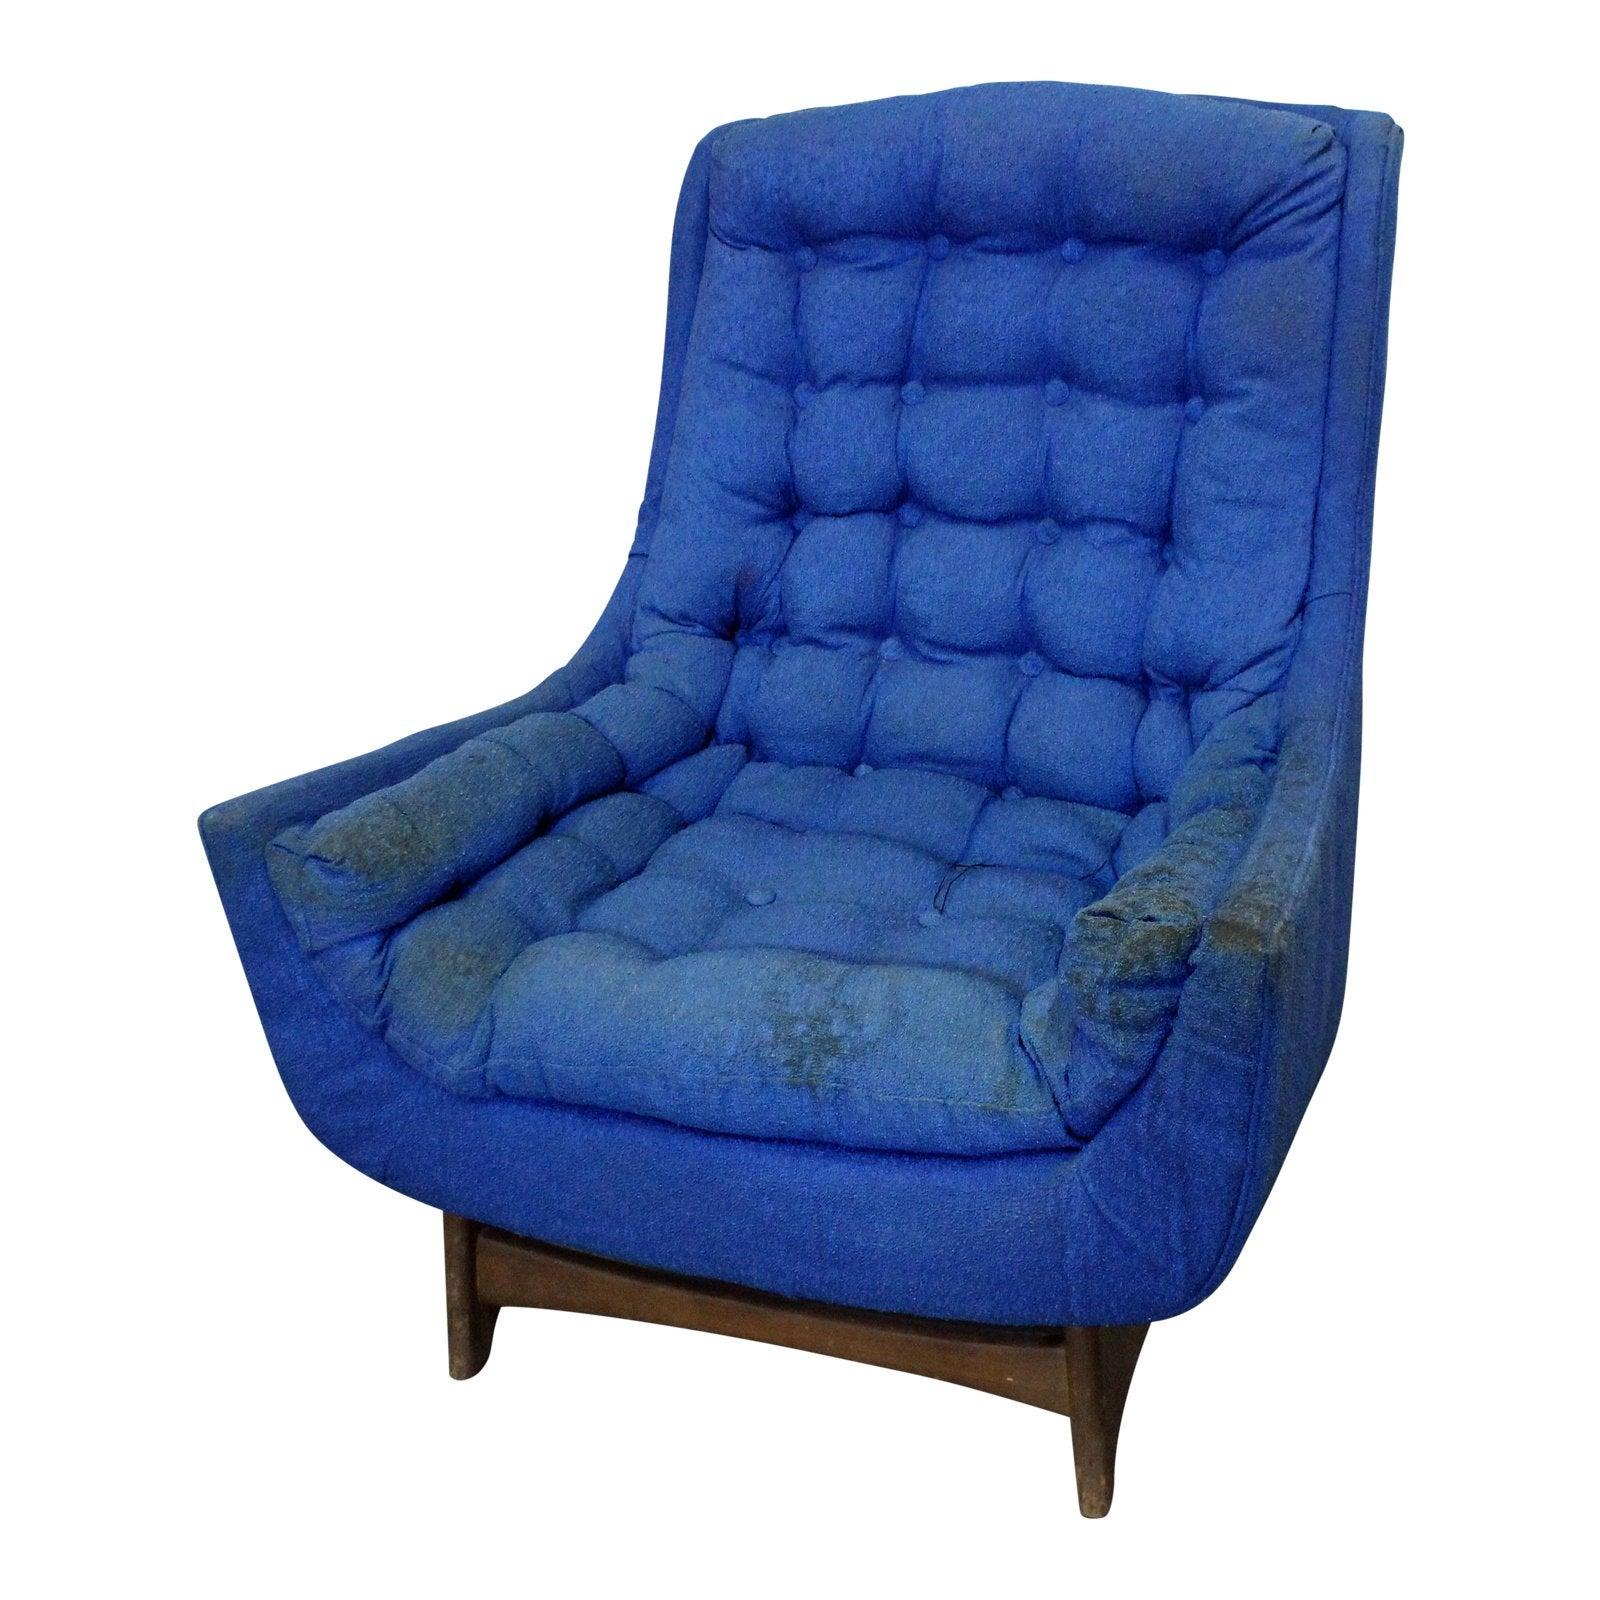 Midcentury Danish Modern Kroehler Walnut Lounge Chair